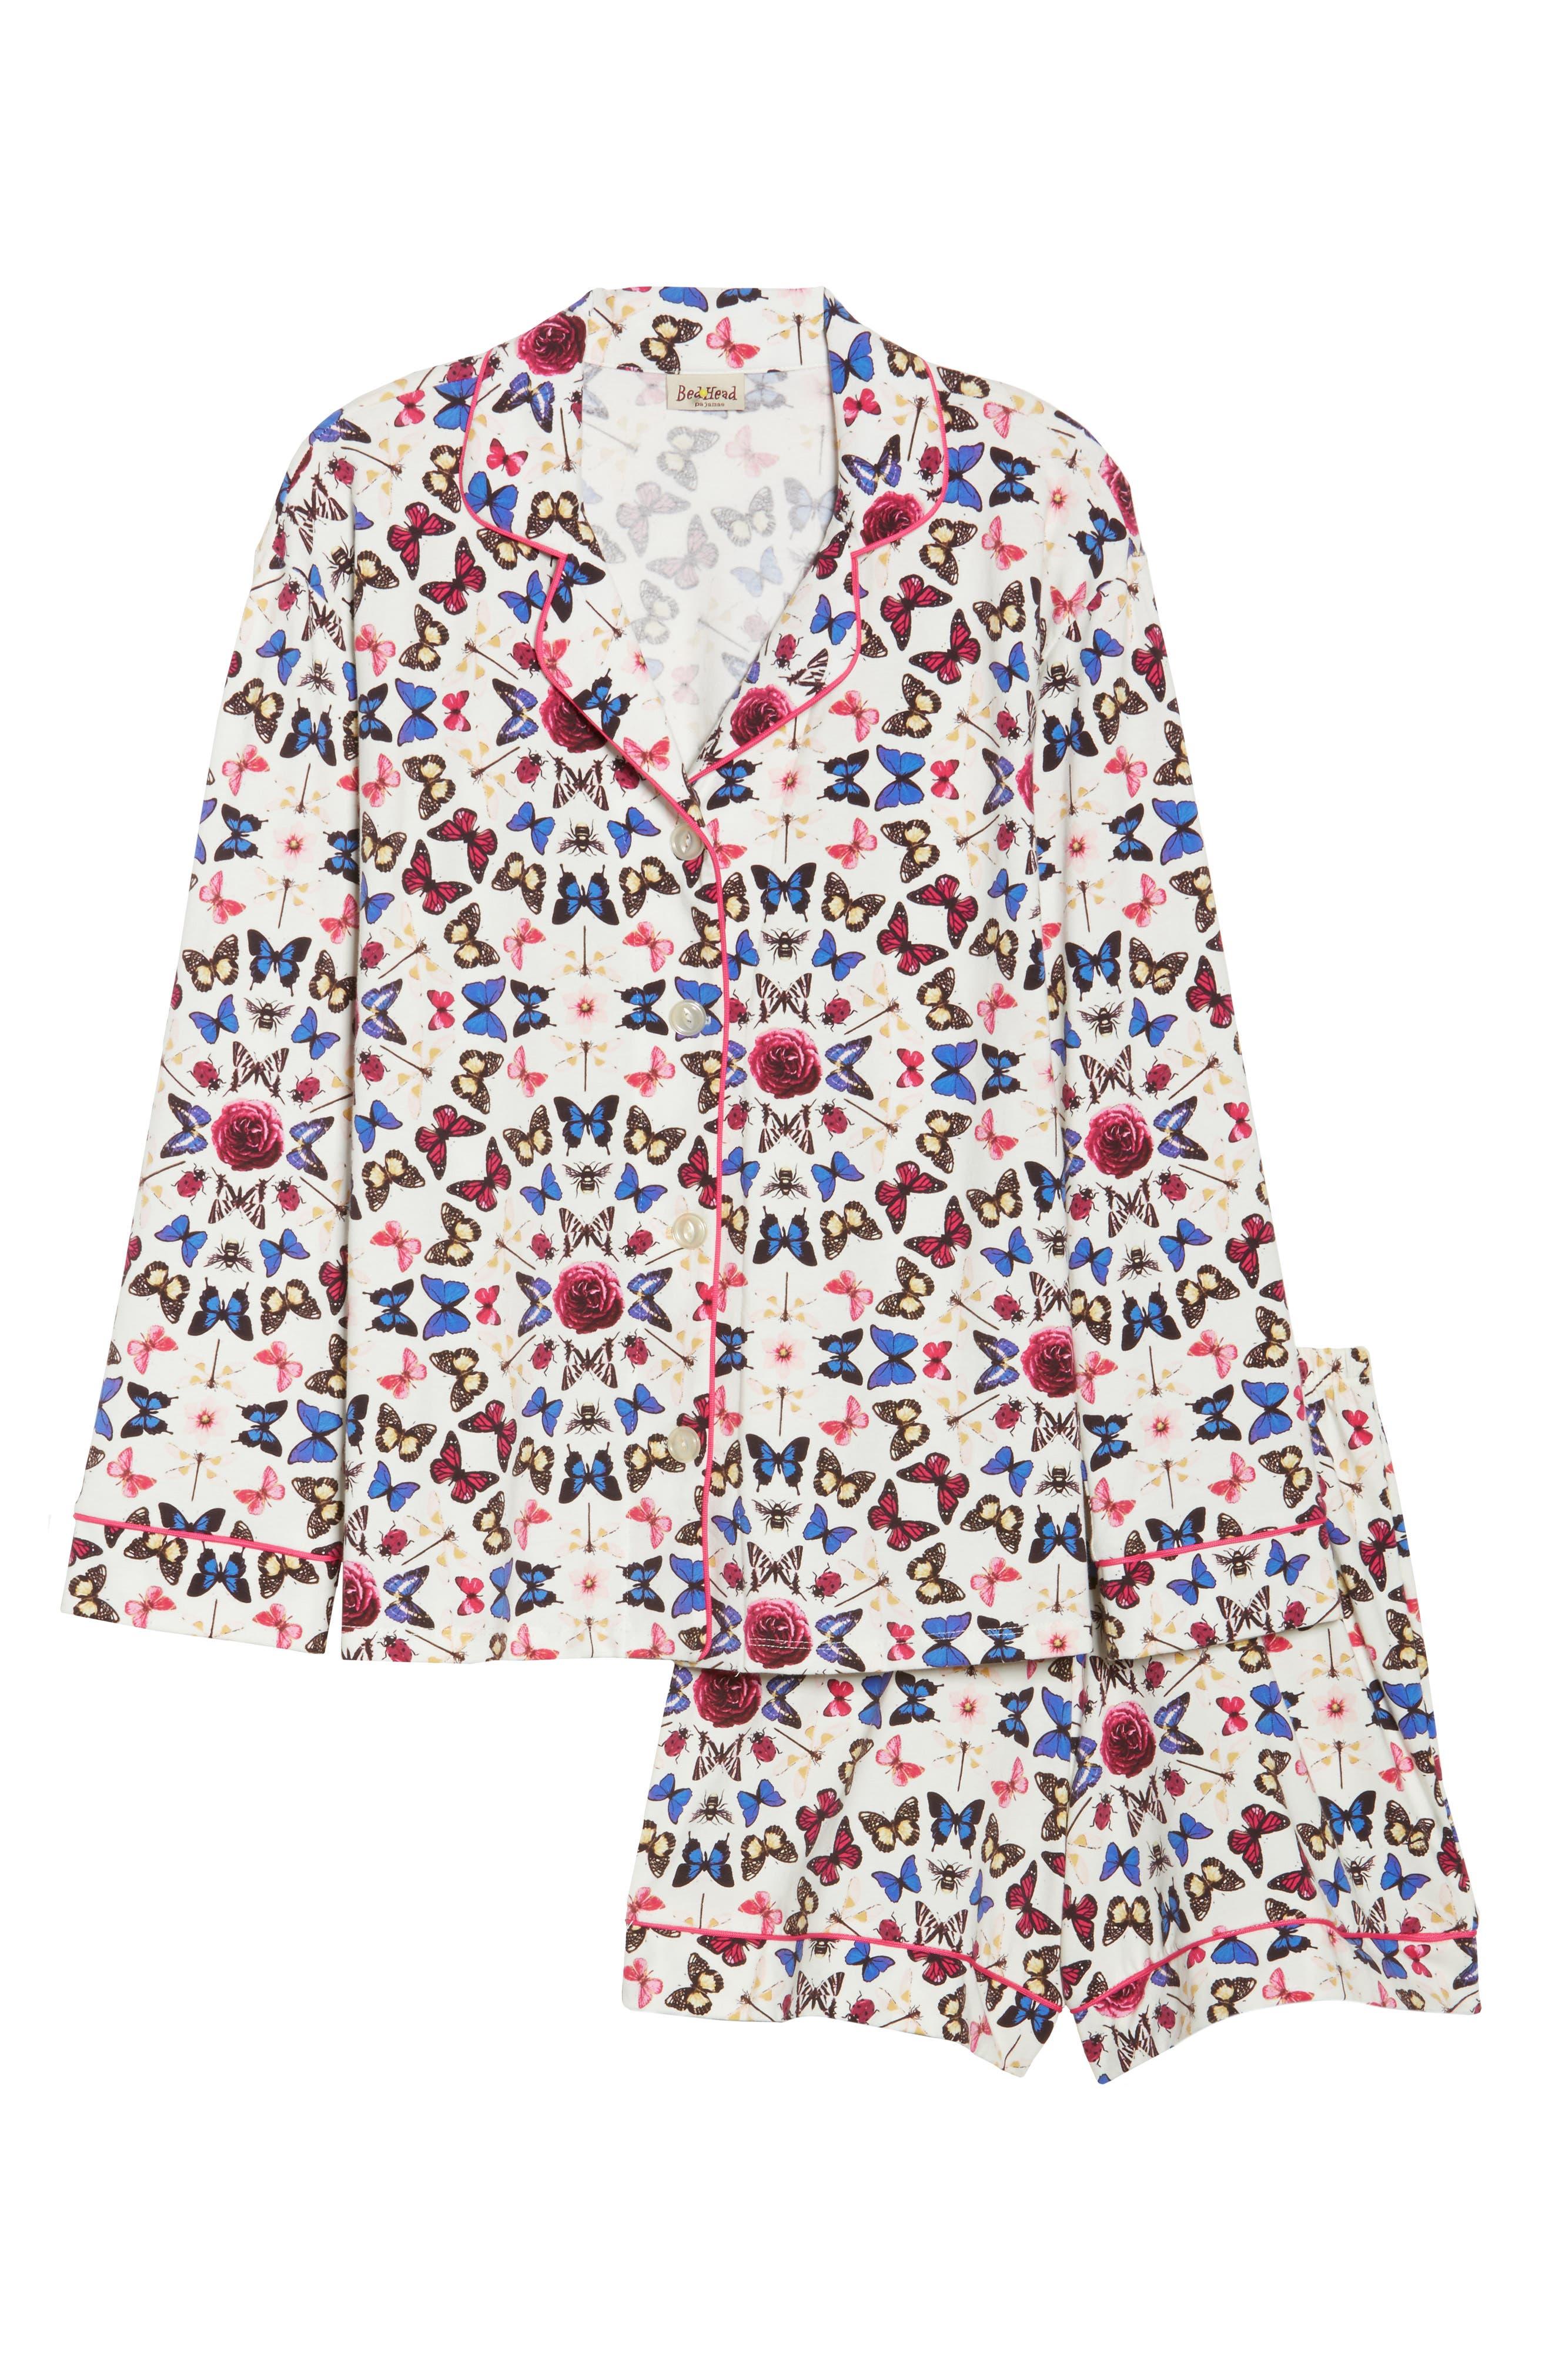 Rouge Short Pajamas,                             Alternate thumbnail 6, color,                             100